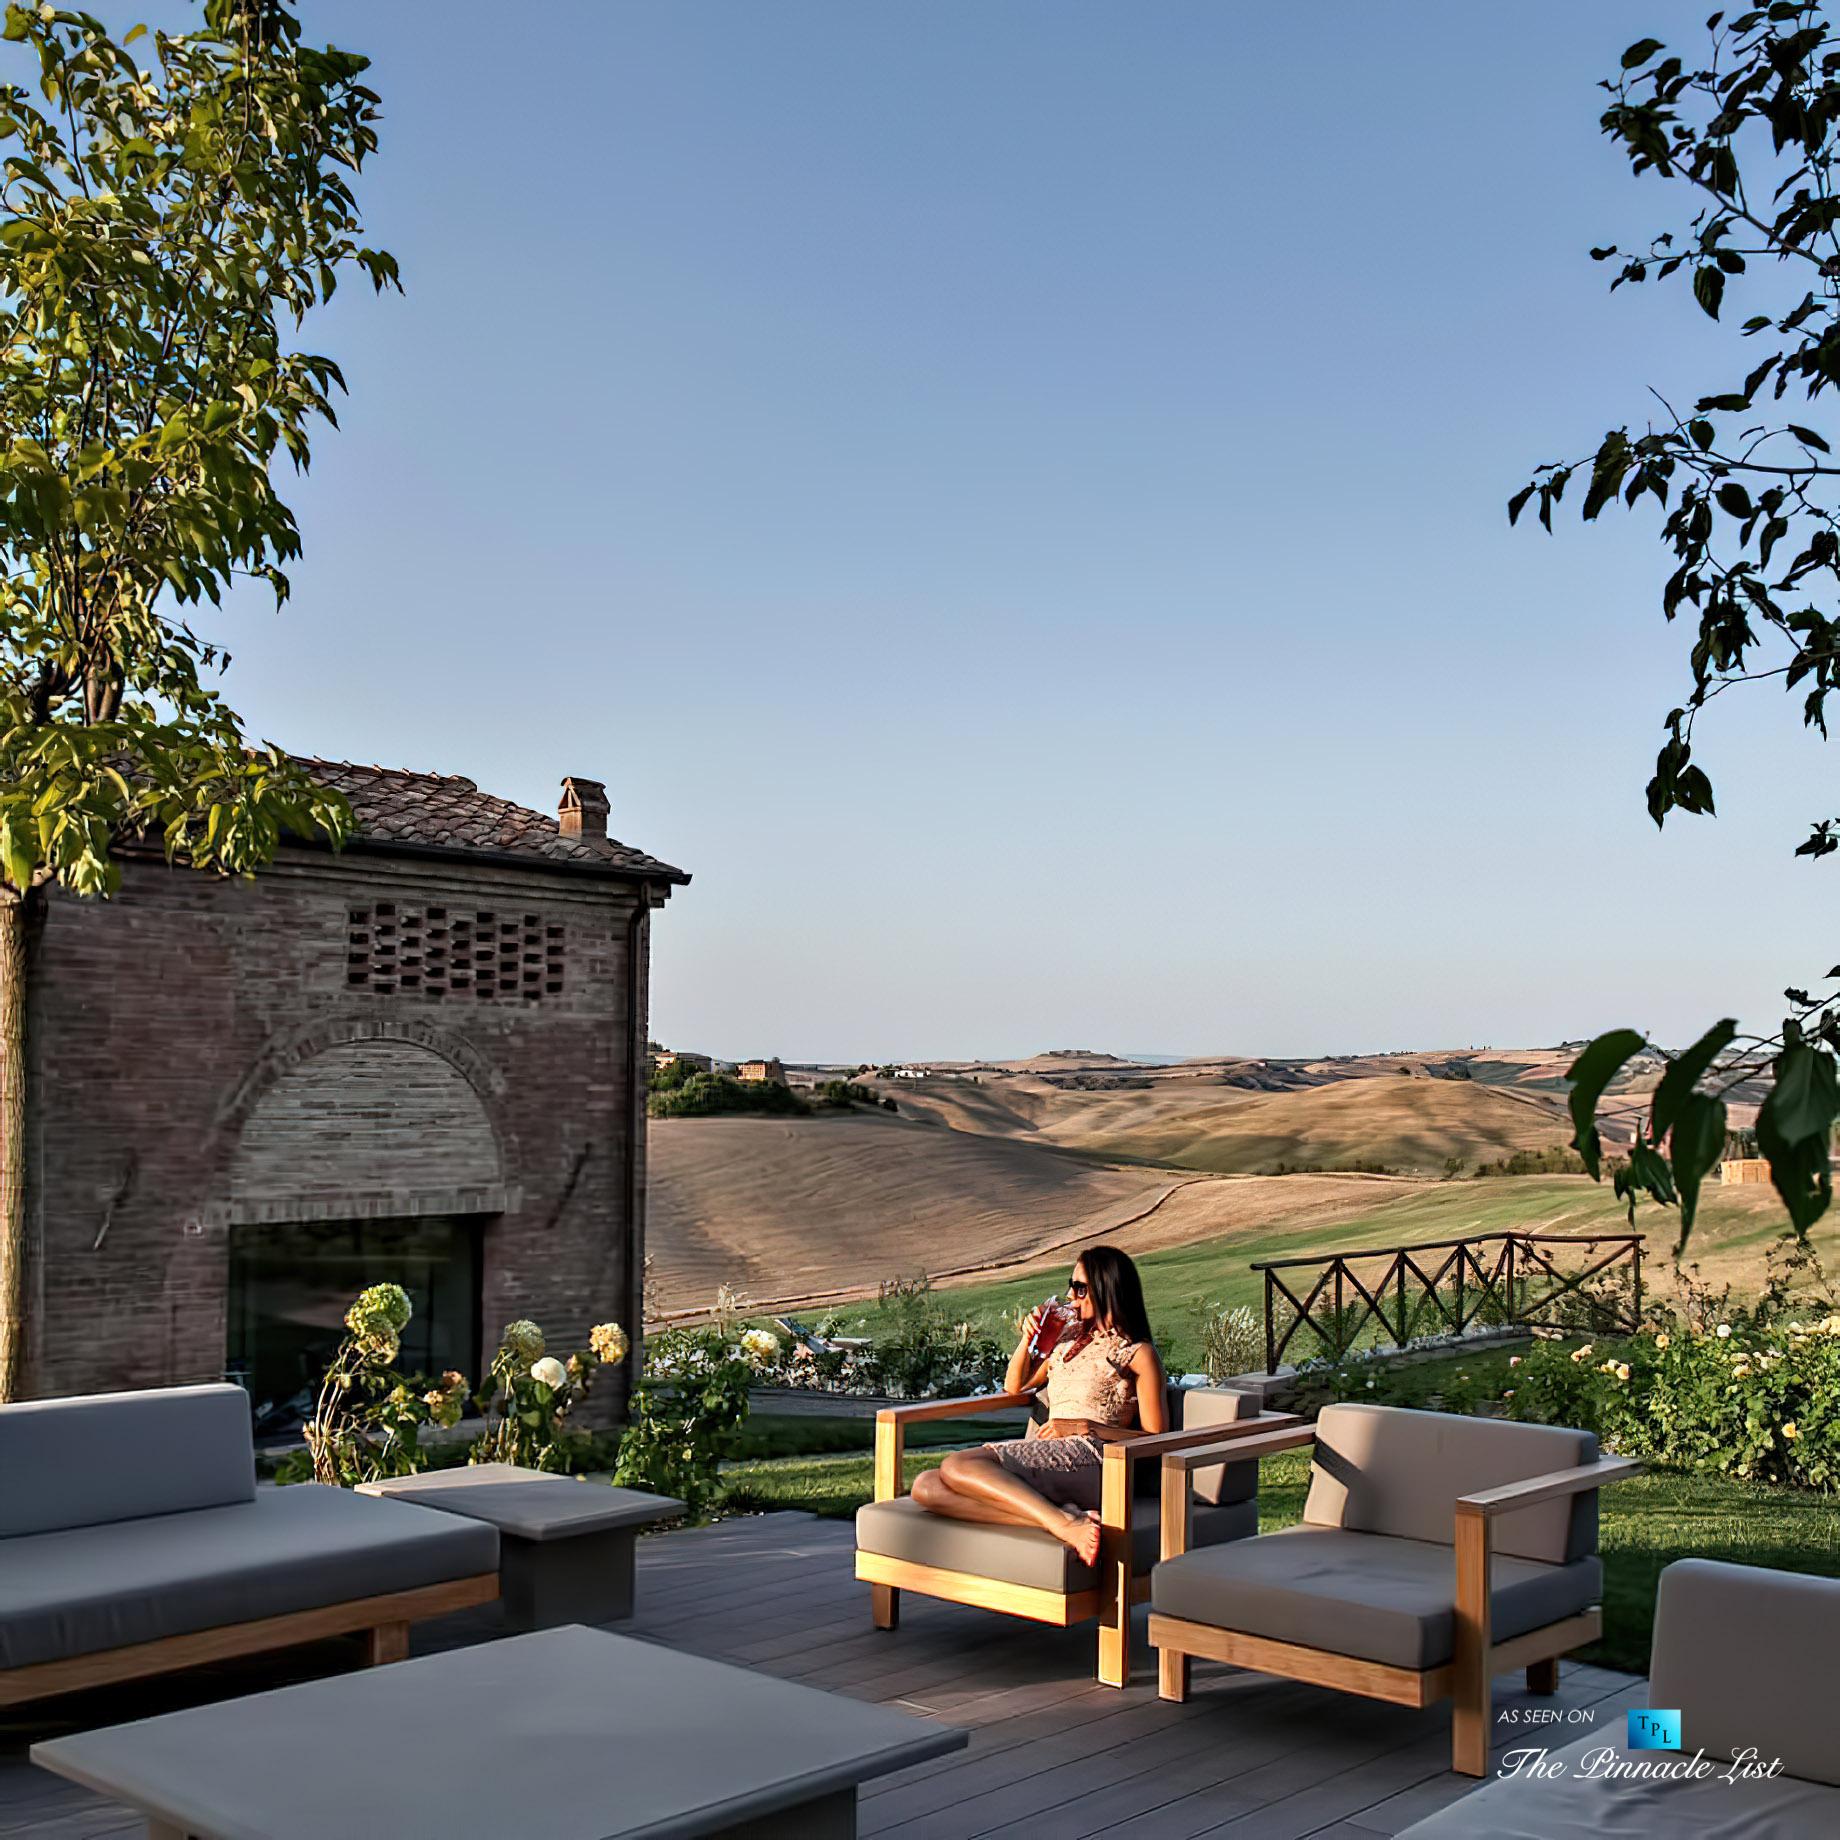 Historic Tuscan Villa - Podere Panico Estate, Monteroni d'Arbia, Siena, Tuscany, Italy - Master Bedroom